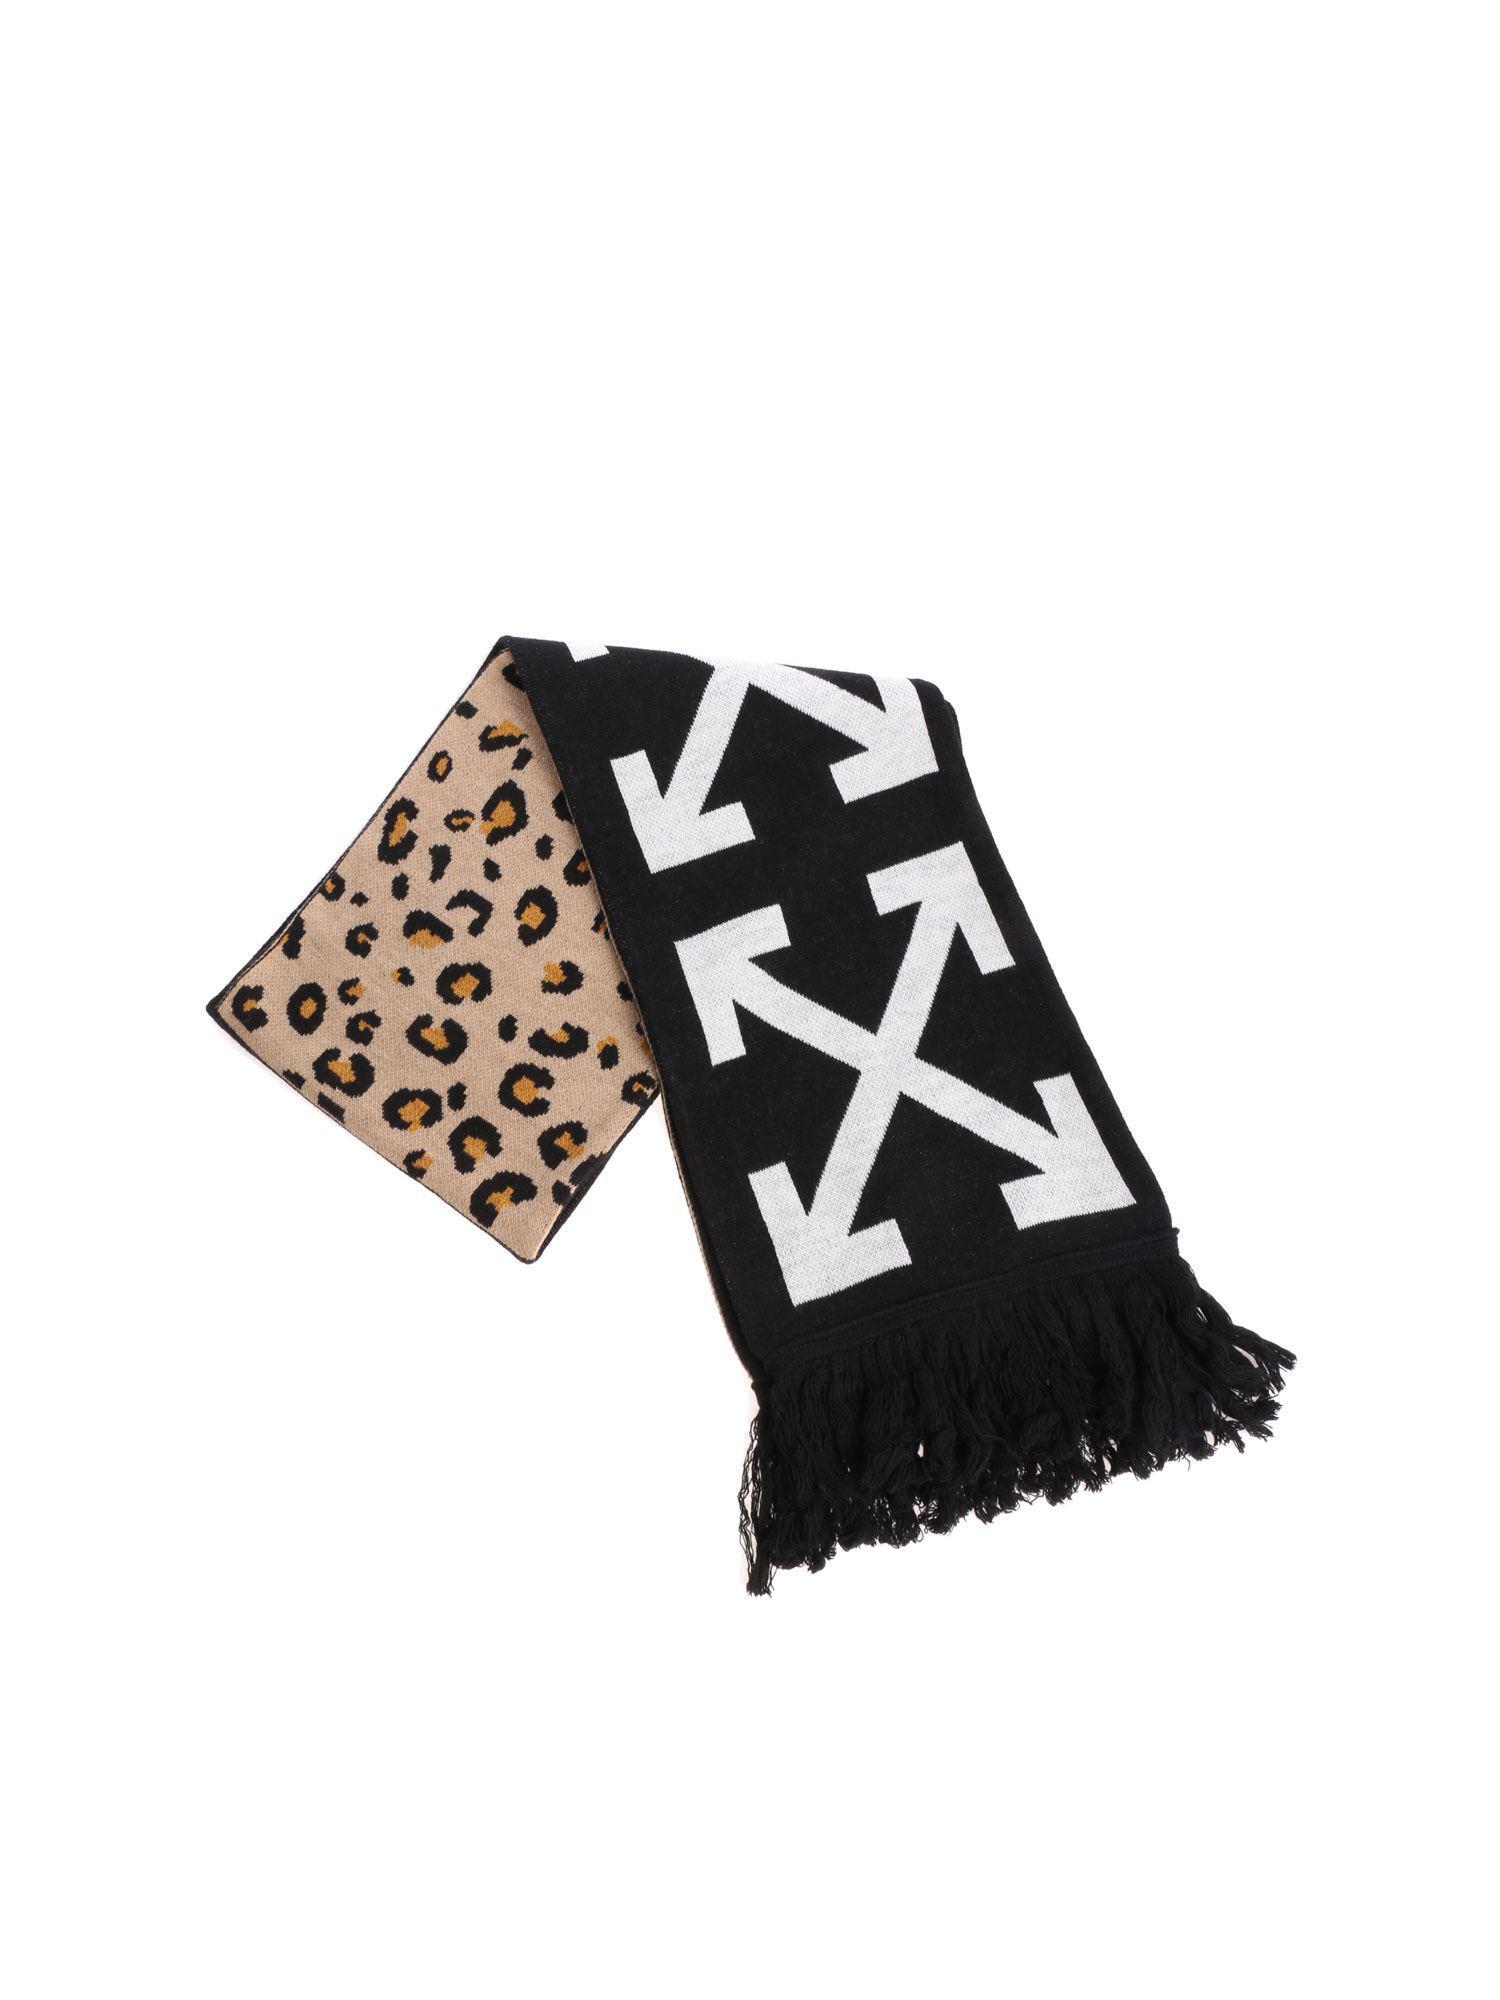 edd43559684e6 Off-White c/o Virgil Abloh Intarsia Wool Blend Scarf in Black for ...